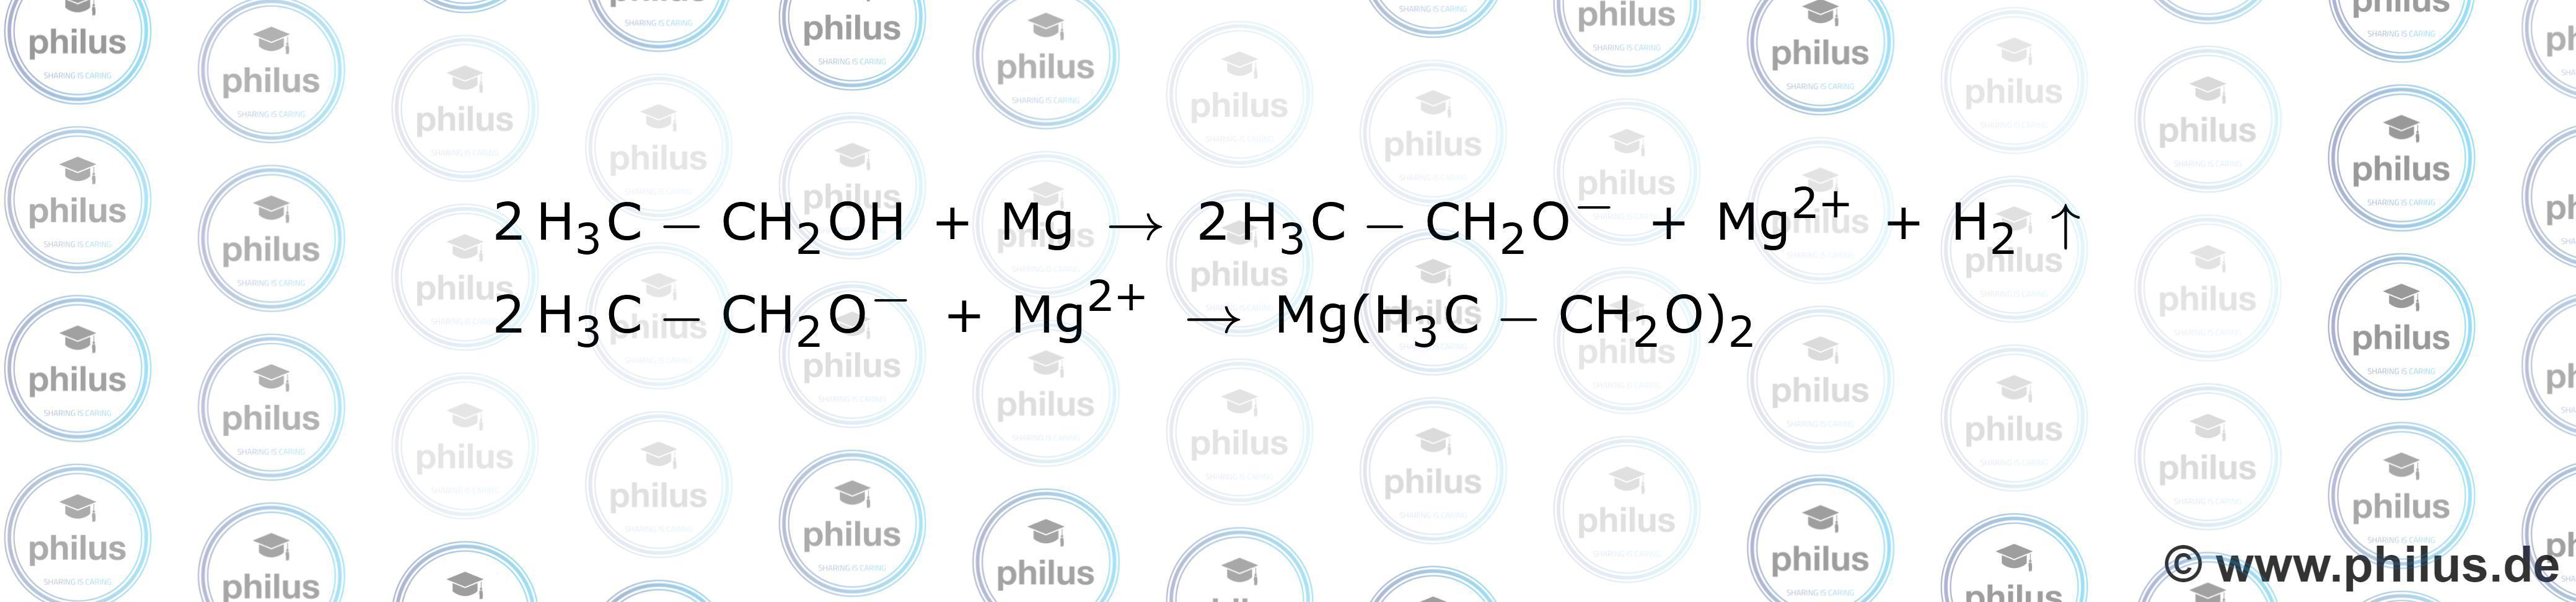 Ethanol (wasserfrei) mit Magnesium zu Magnesiumethanolat